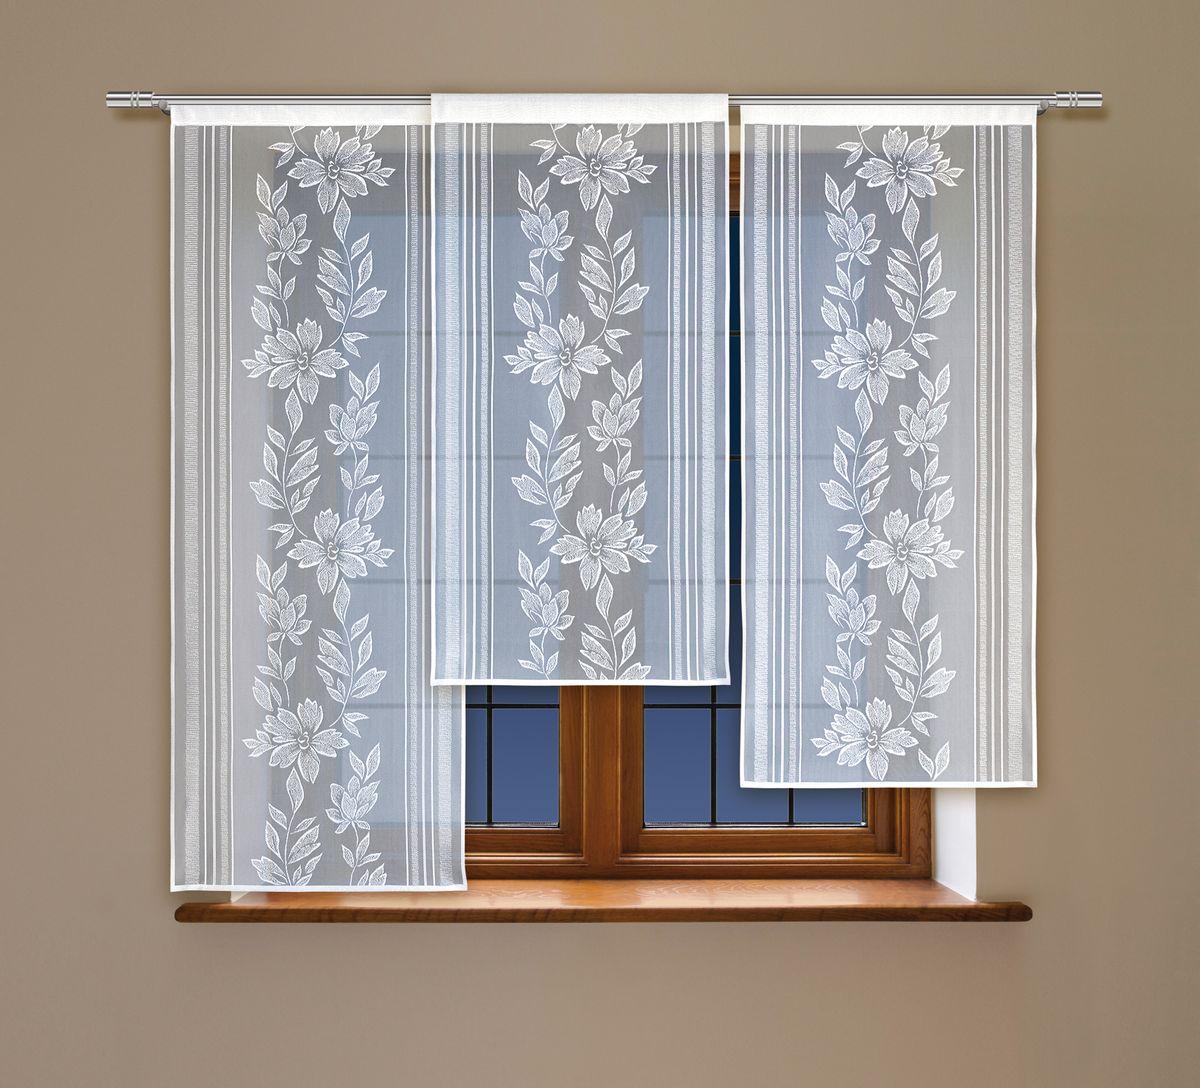 Комплект гардин Haft, на кулиске, цвет: белый, 3 шт. 212050 комплект гардин панно haft шторы светлые page 10